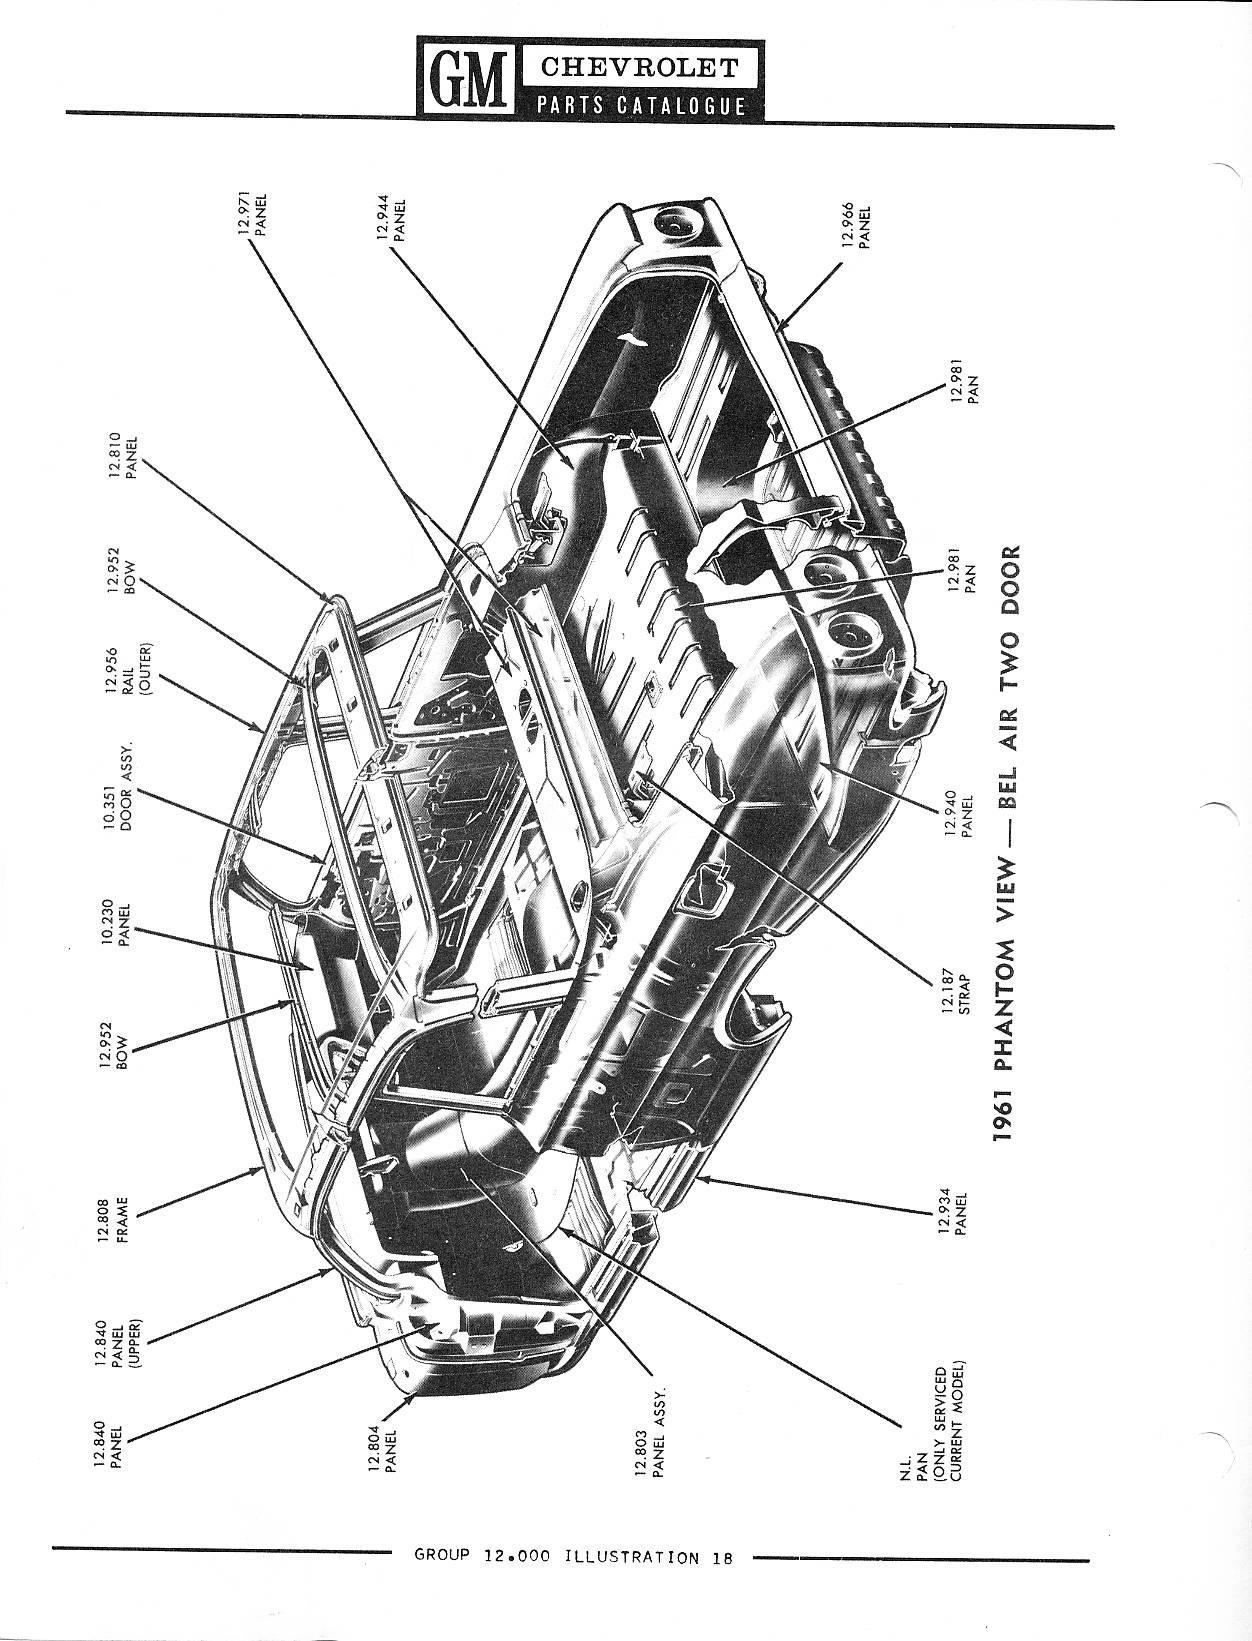 1958-1968 Chevrolet Parts Catalog / Image174.jpg